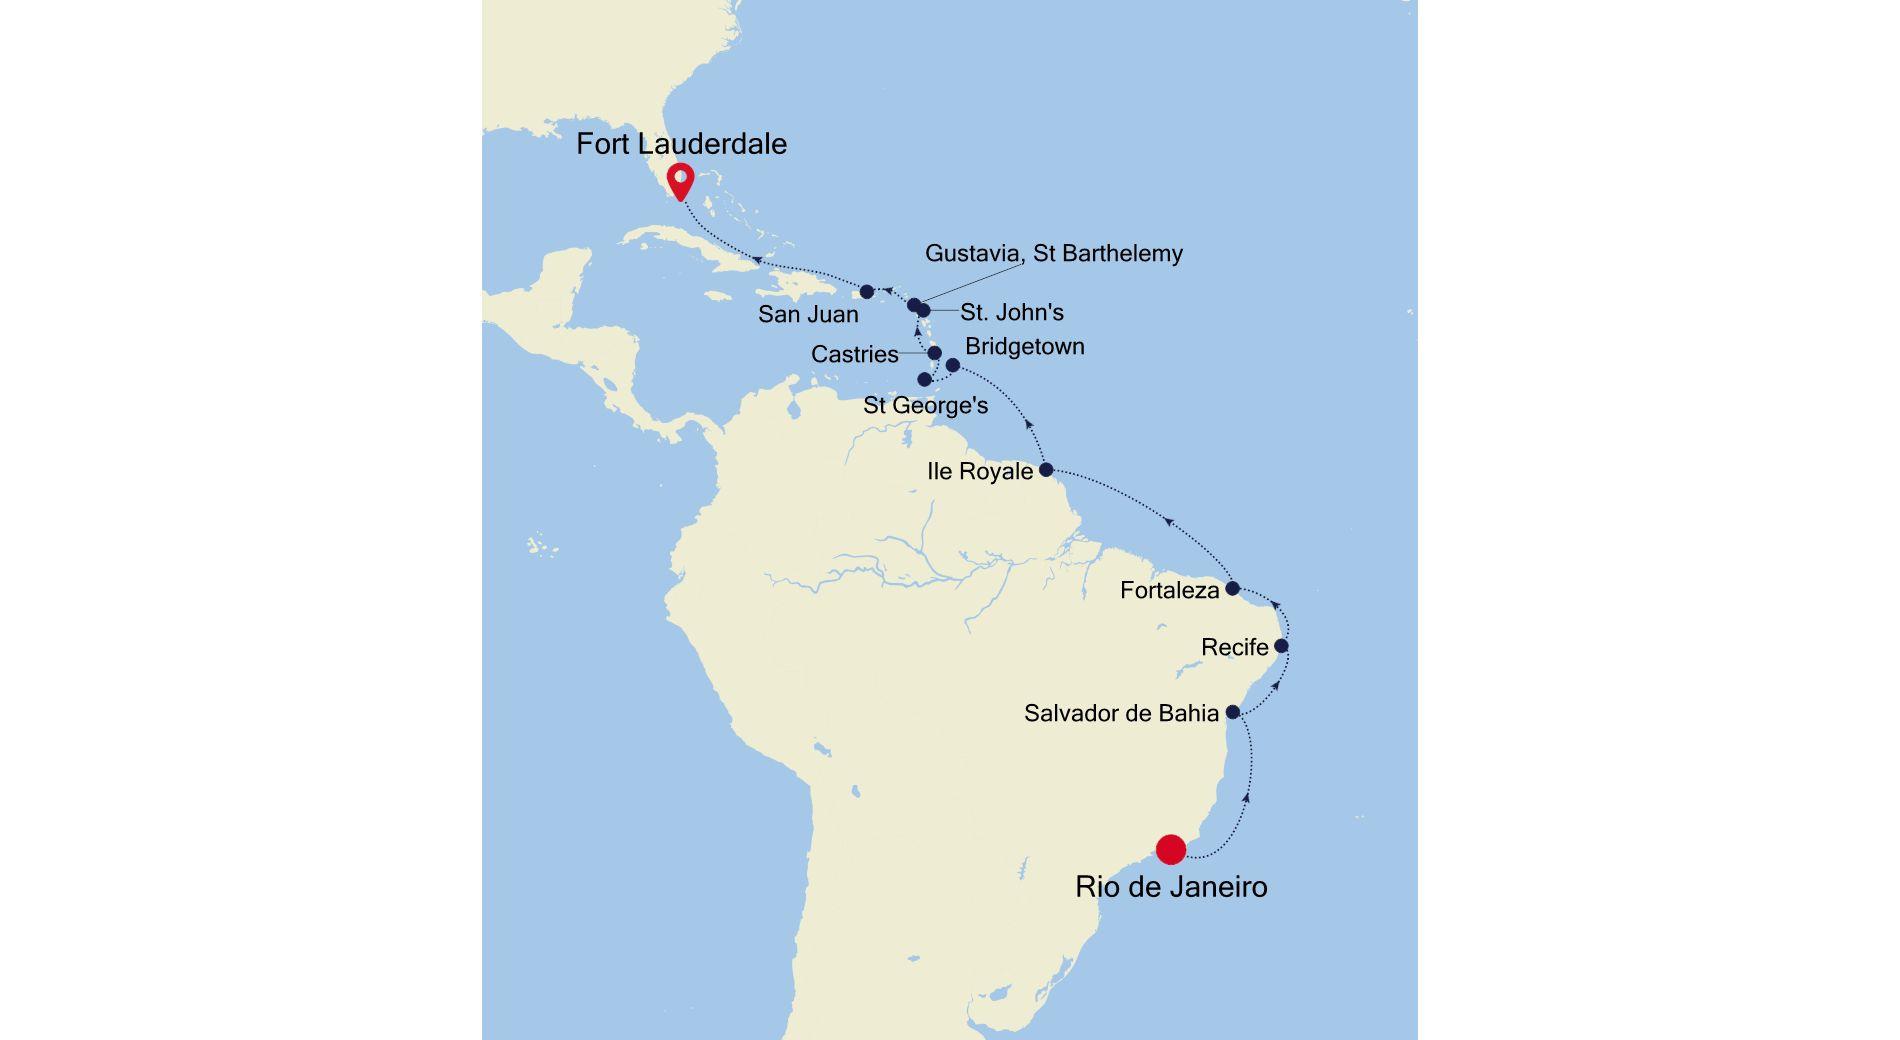 MO210224021 - Rio de Janeiro a Fort Lauderdale